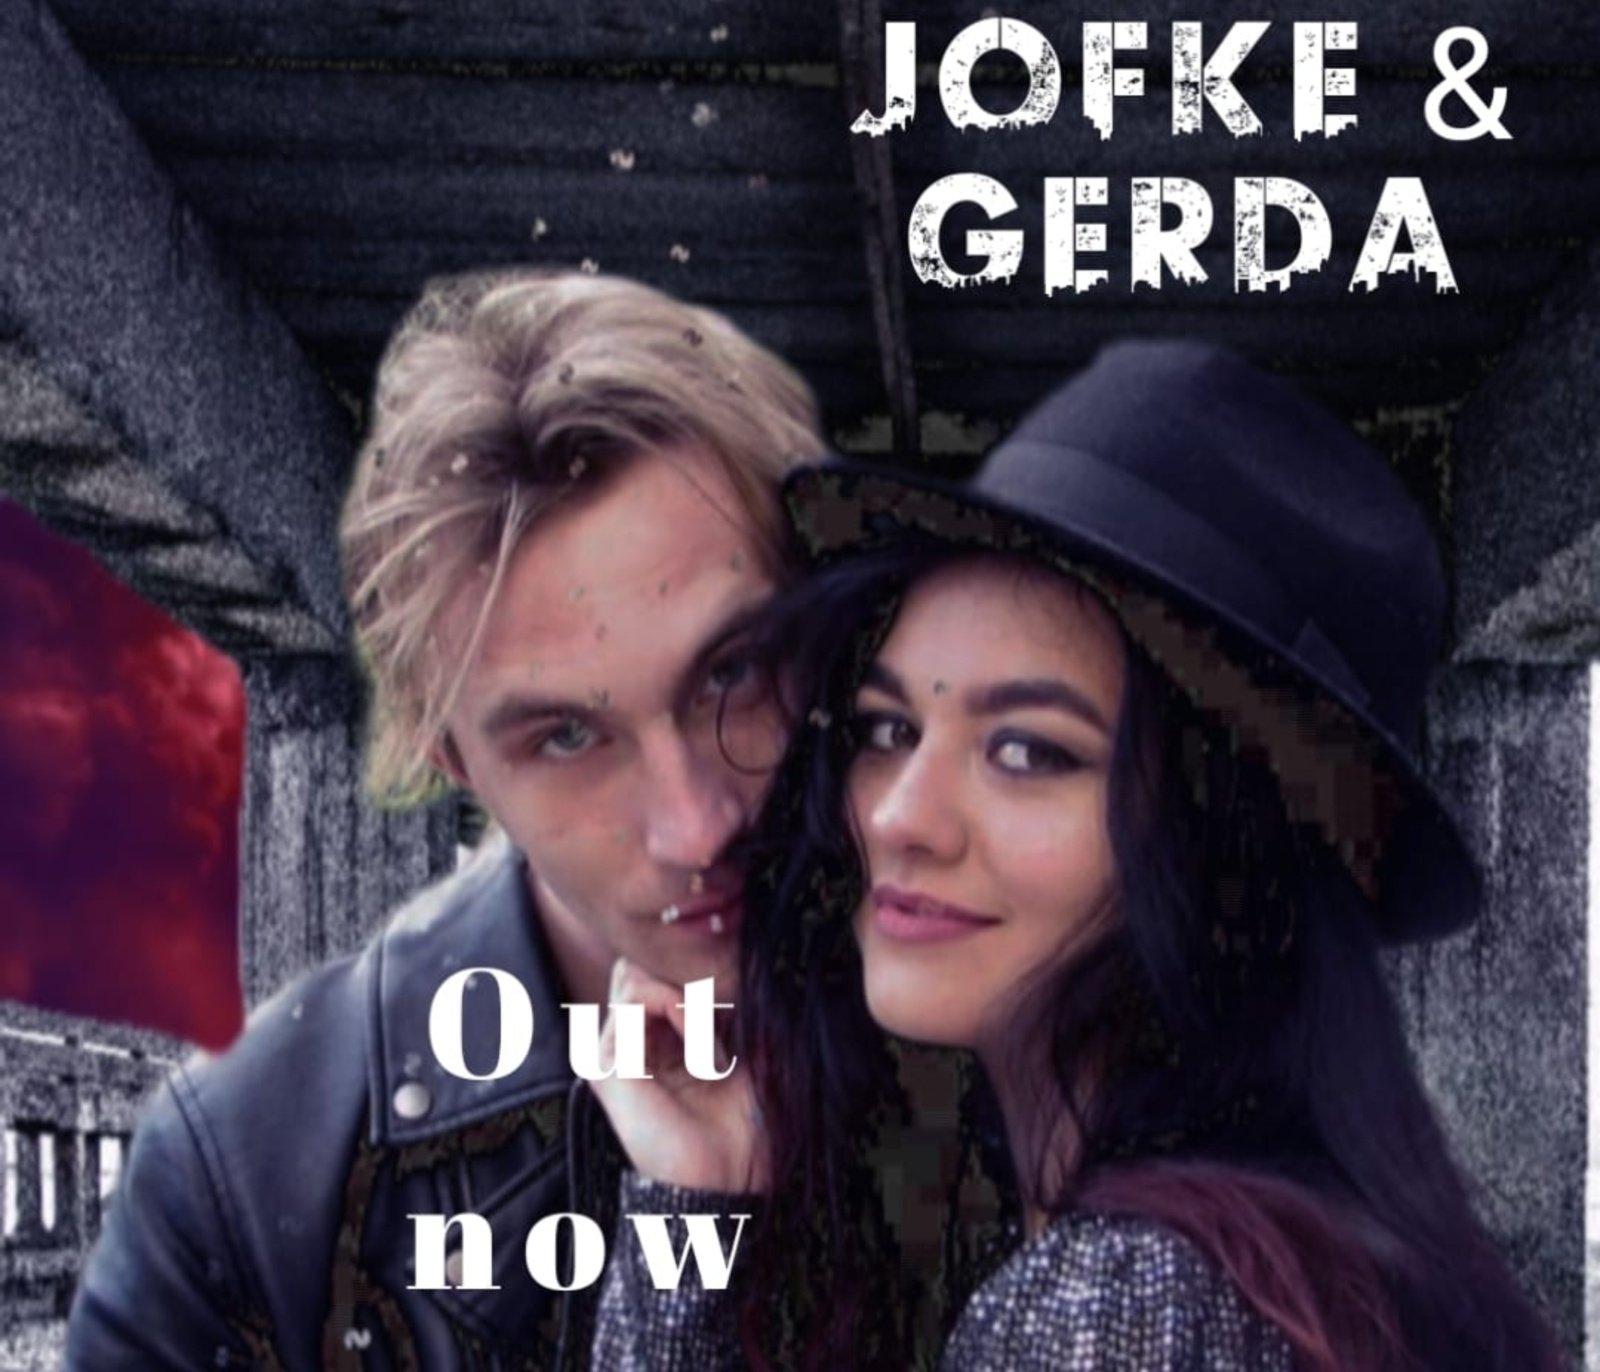 Gerda Zaptoriūtė kartu su vyru pristato dainą